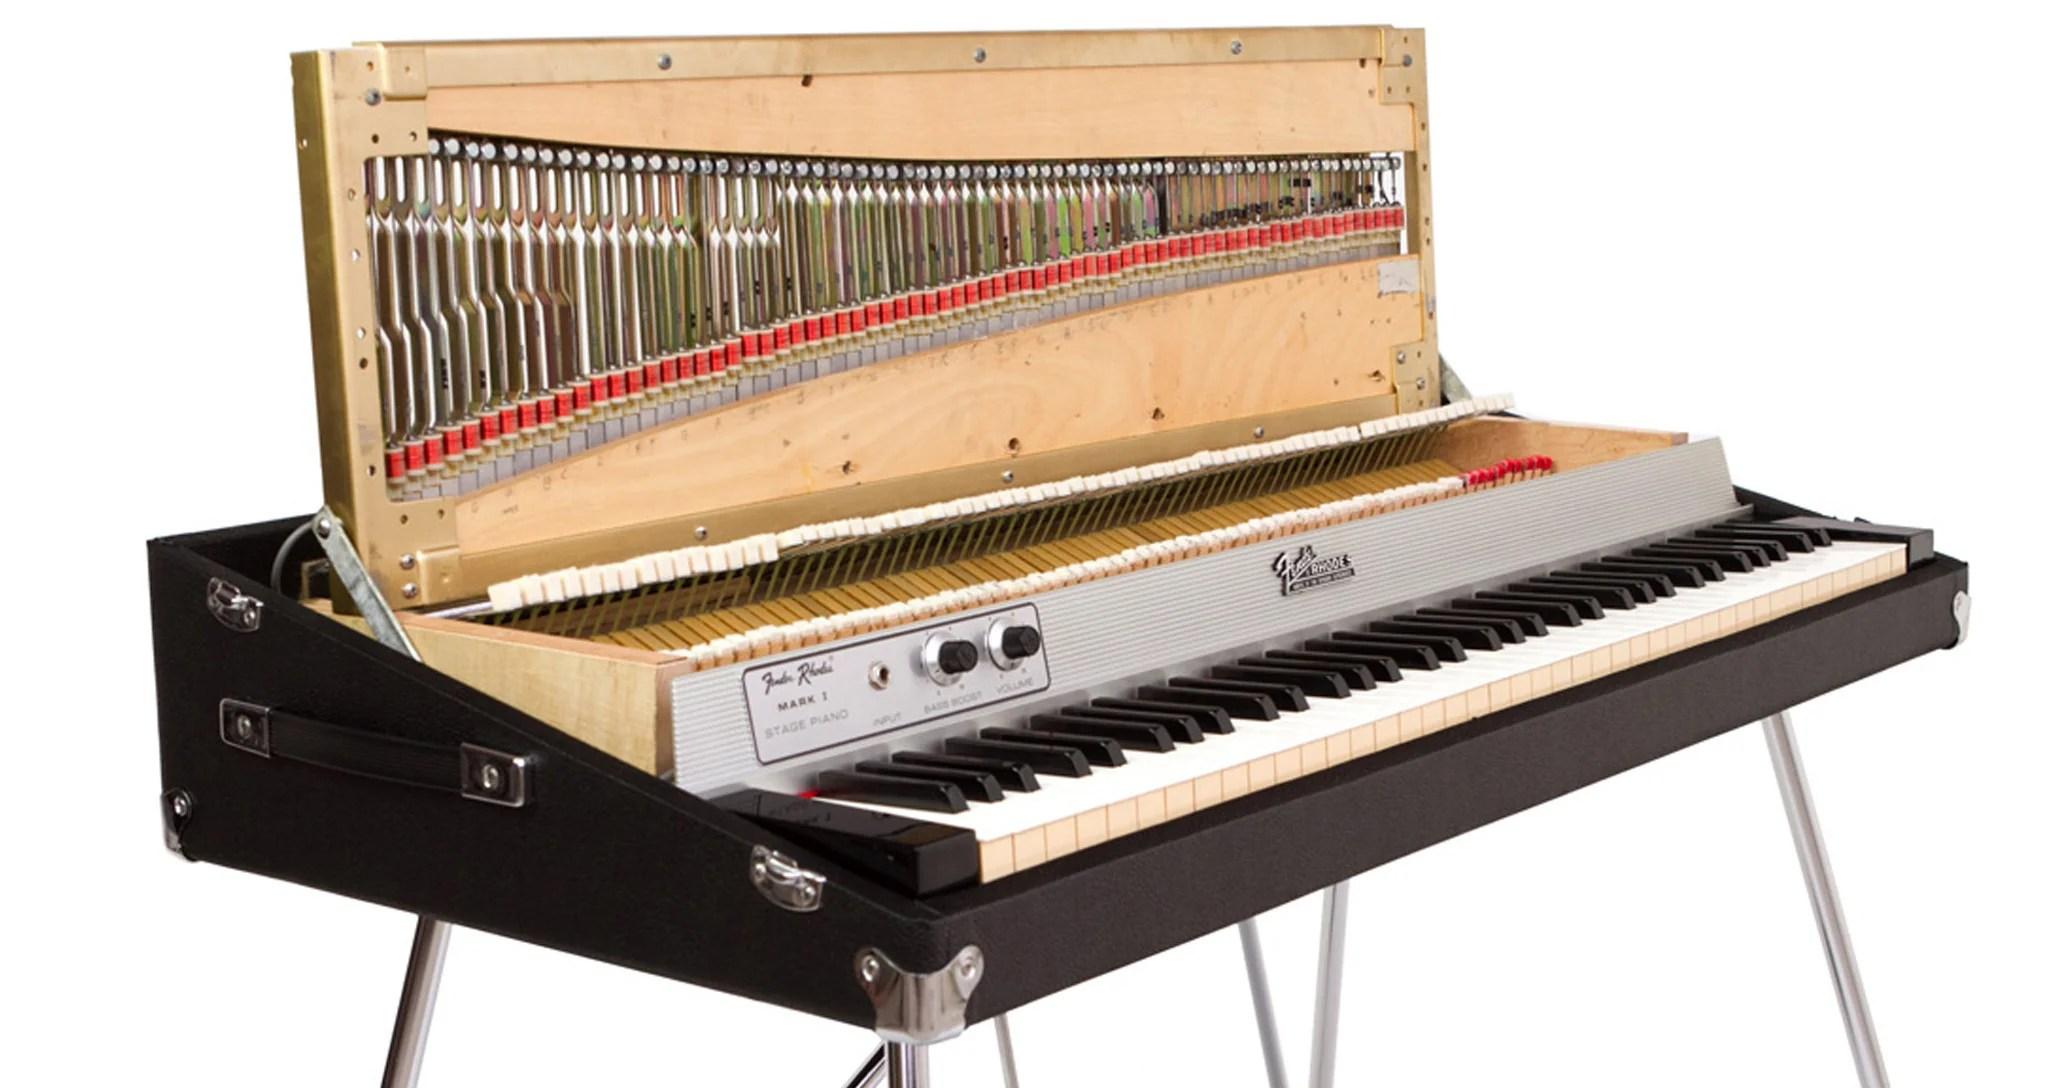 fender rhodes stage piano parts diagram [ 2048 x 1088 Pixel ]